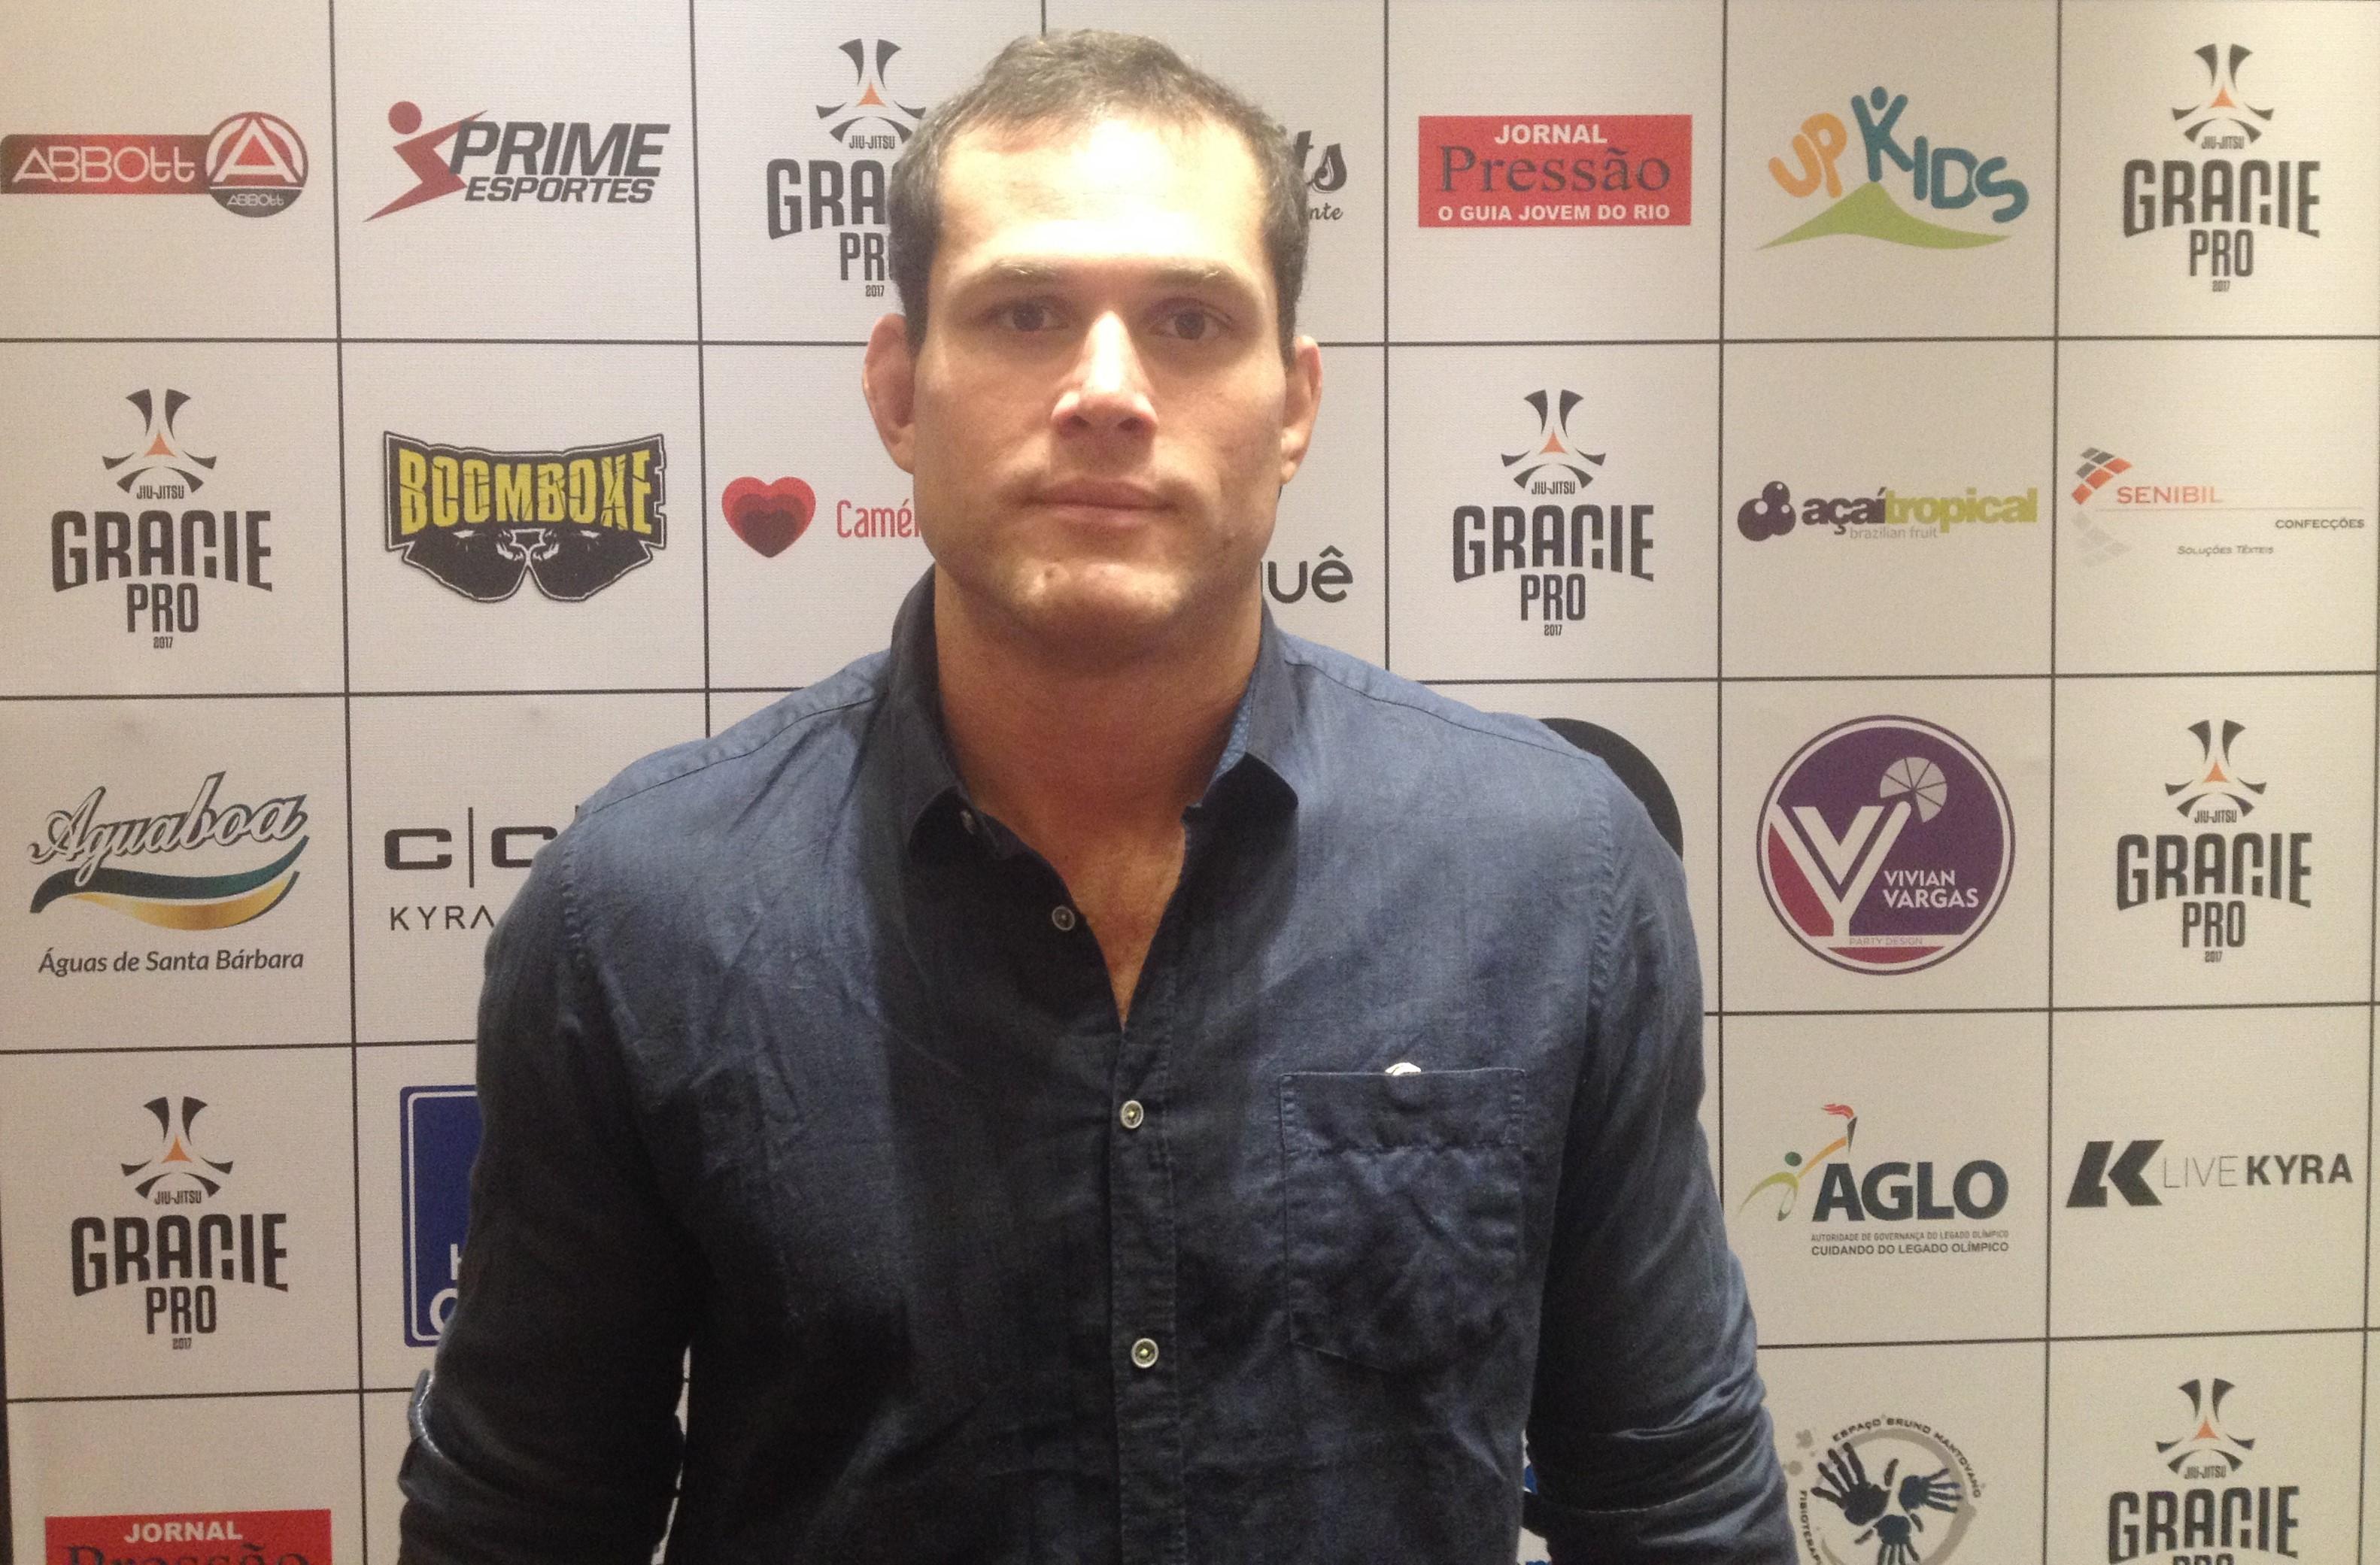 Roger Gracie fará revanche contra Marcus Buchecha no Gracie Pro (Foto: Renato Senna/Torcedores.com)